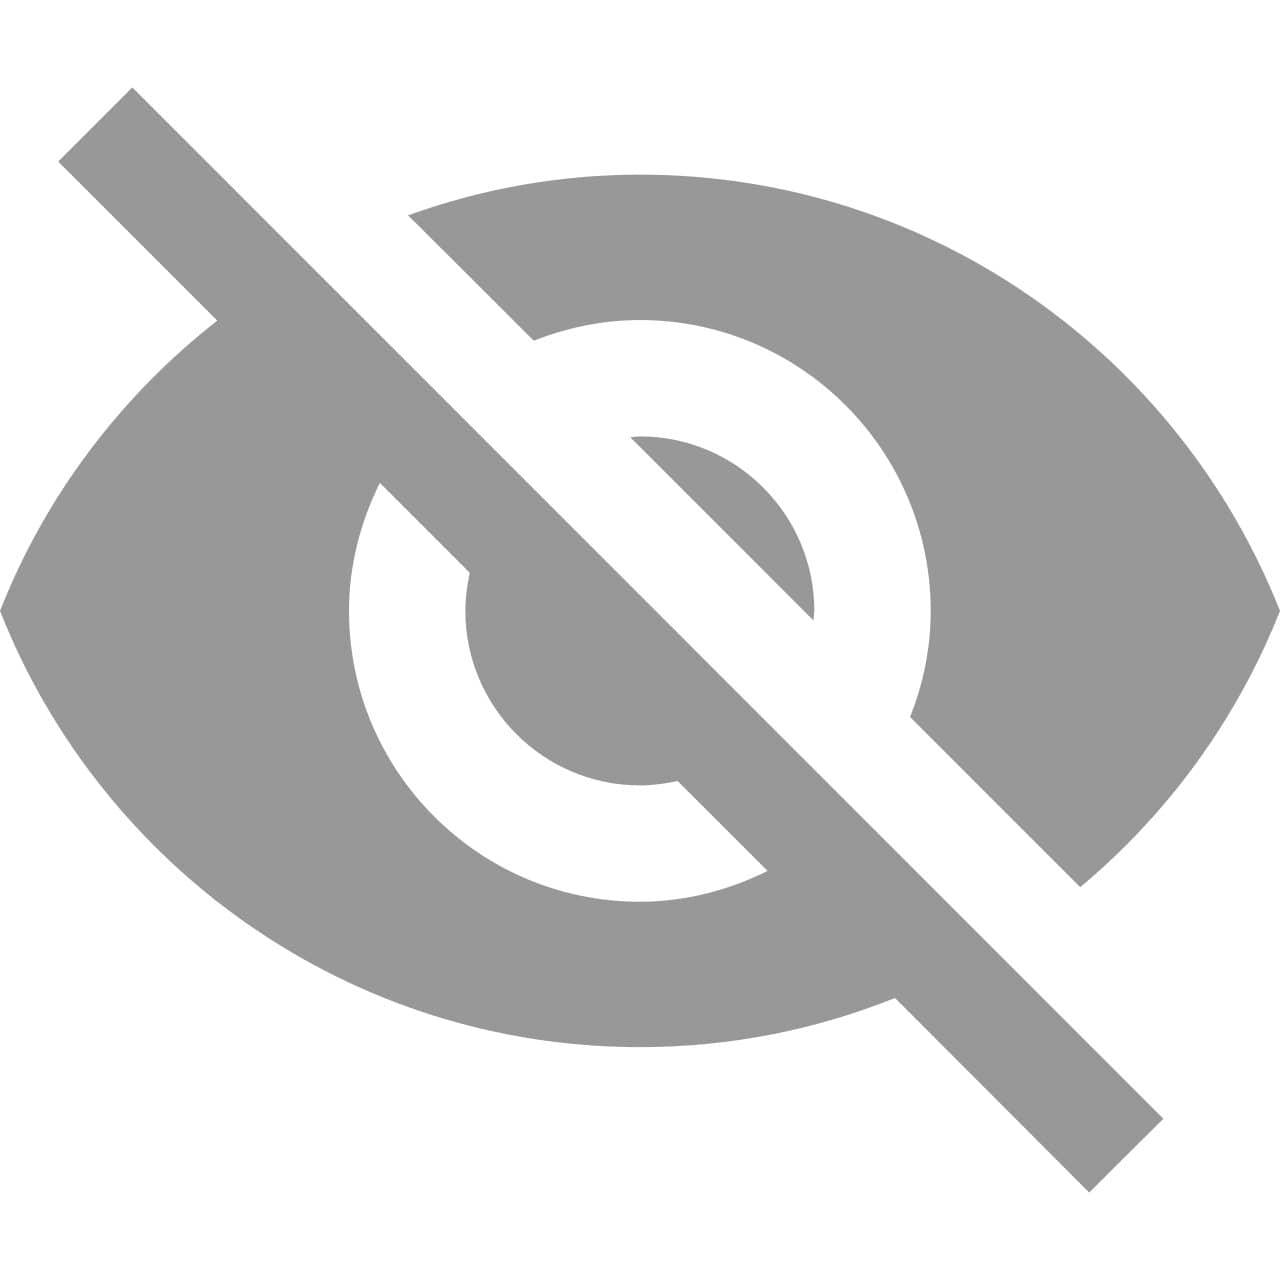 Mute/Unmute Functionality